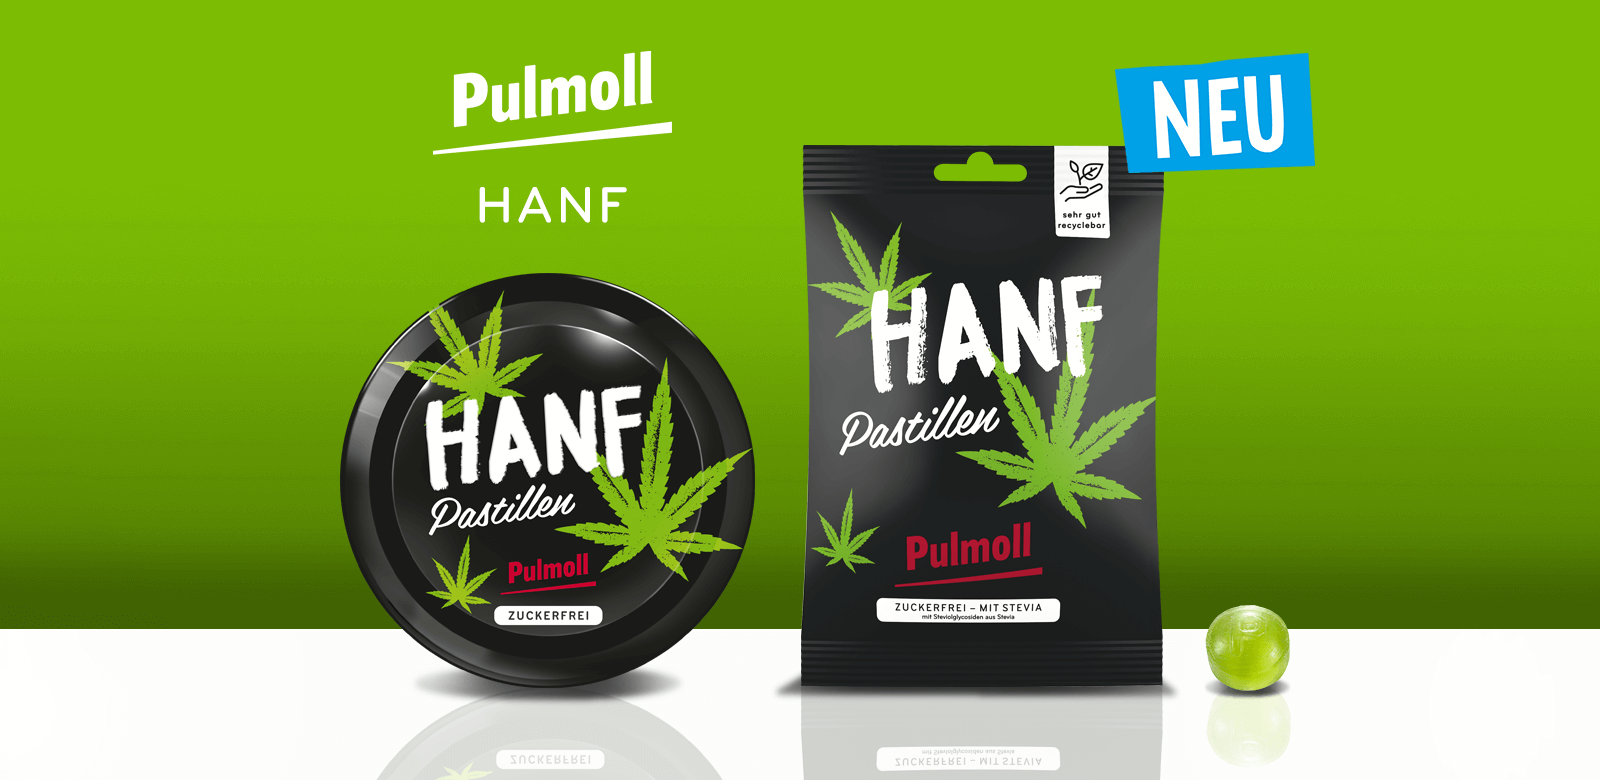 Hanf - Neue Hustenbonbon SOrte